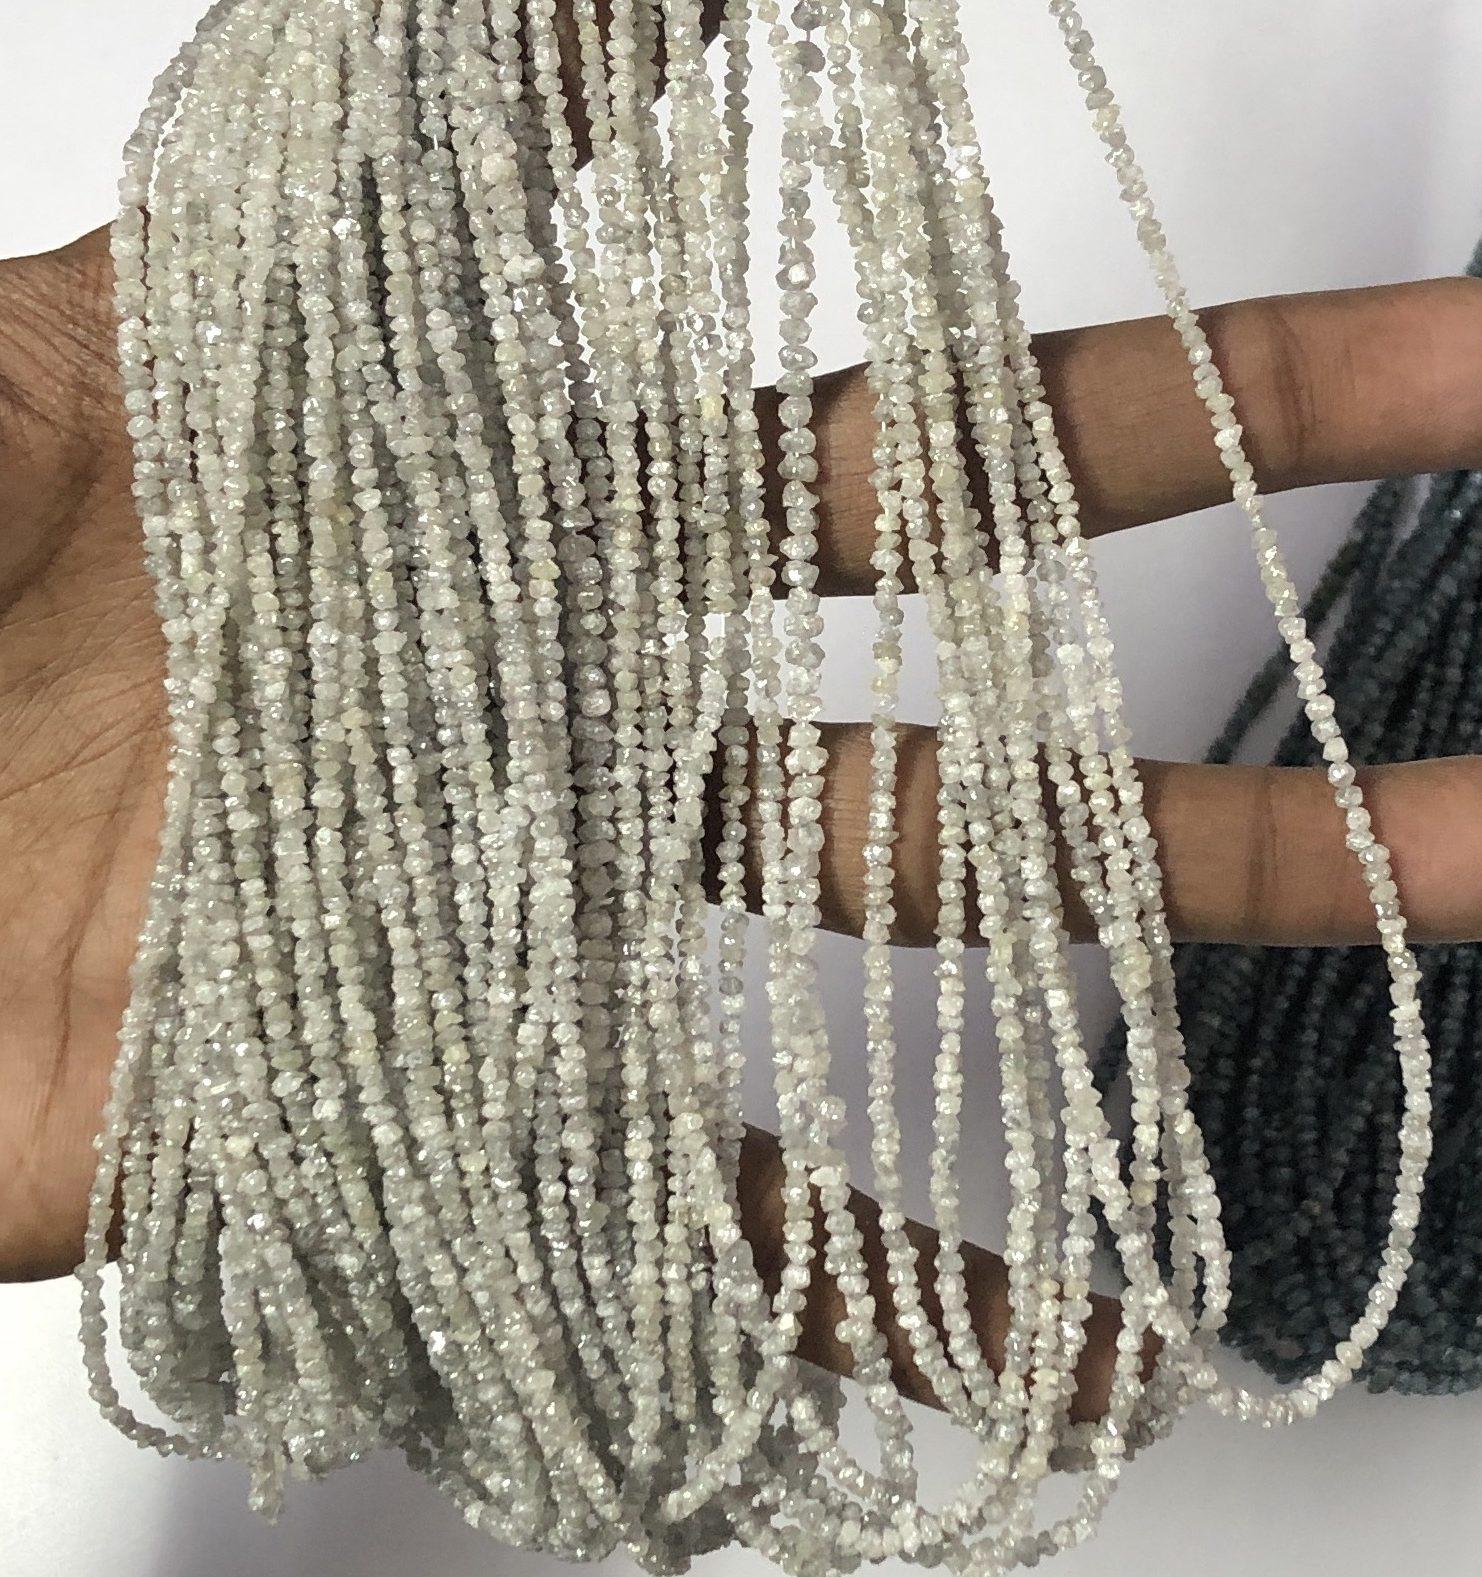 Shop White Diamond Rough Uncut Chips Beads Strand - FREE SHIPPING